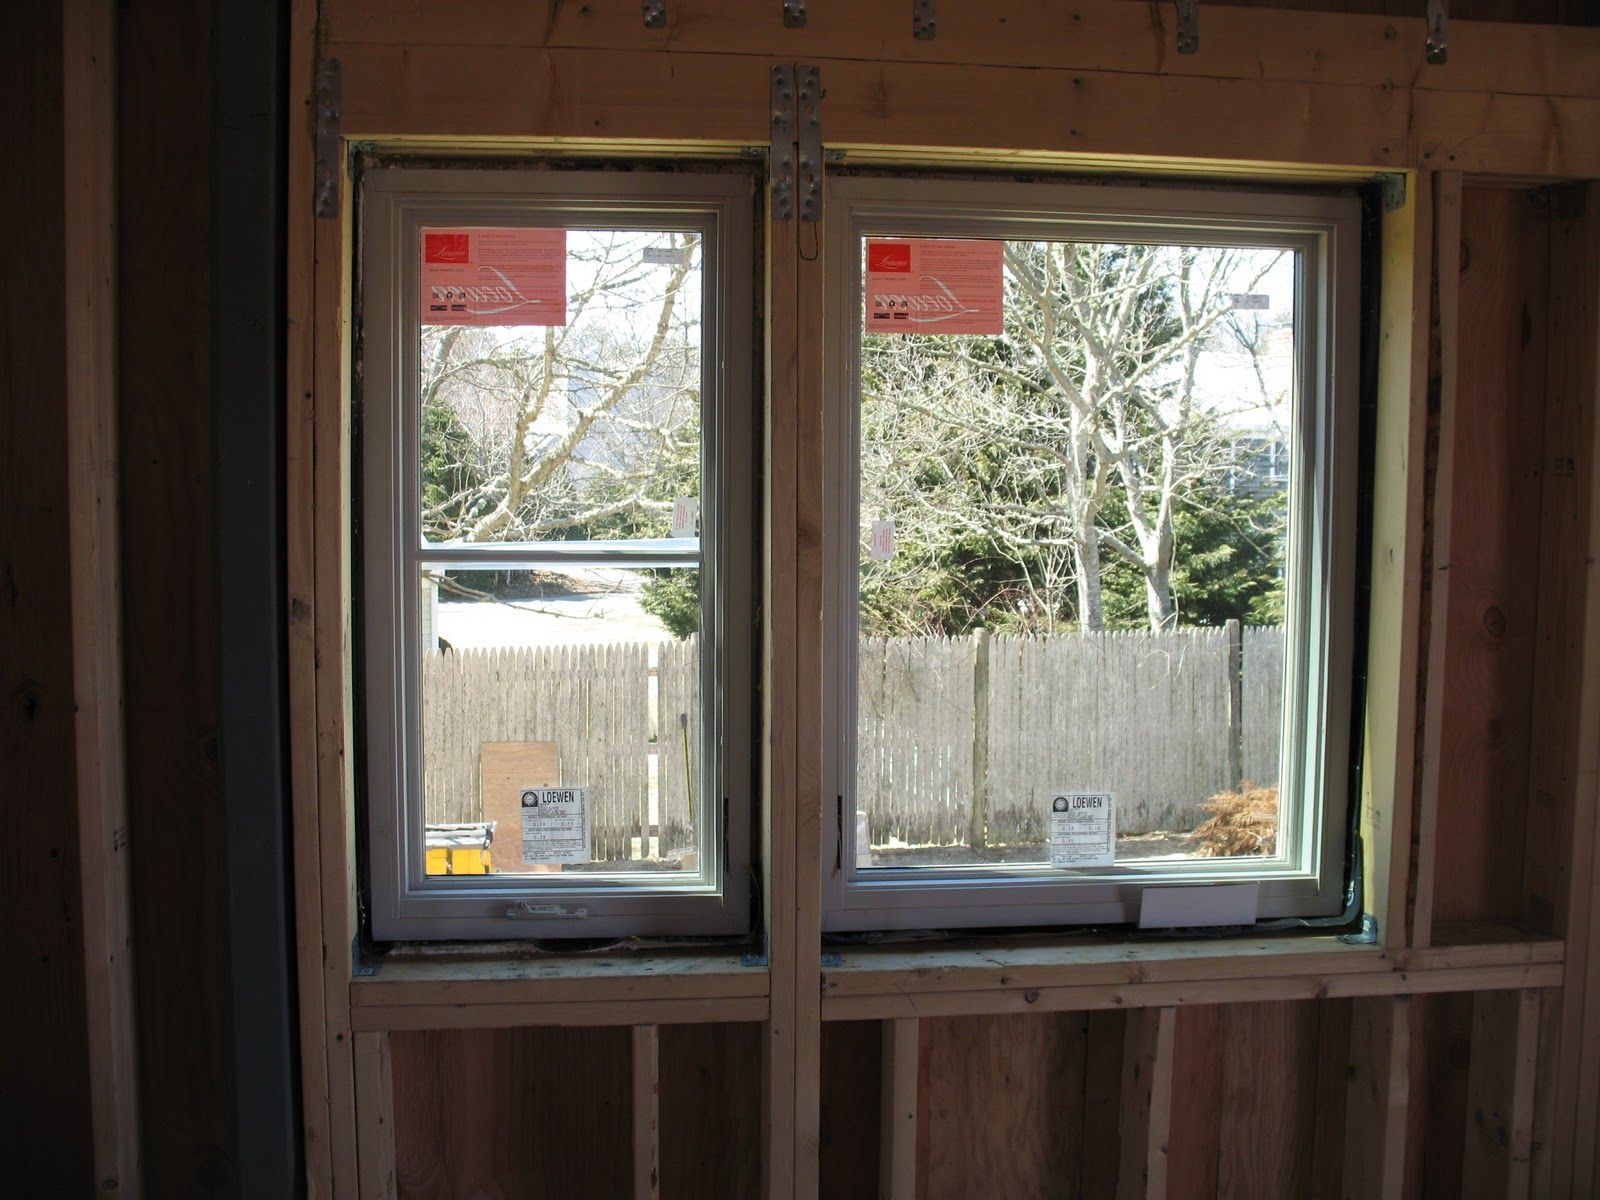 Net Zero Energy Cape Cod Windows Installation Begins